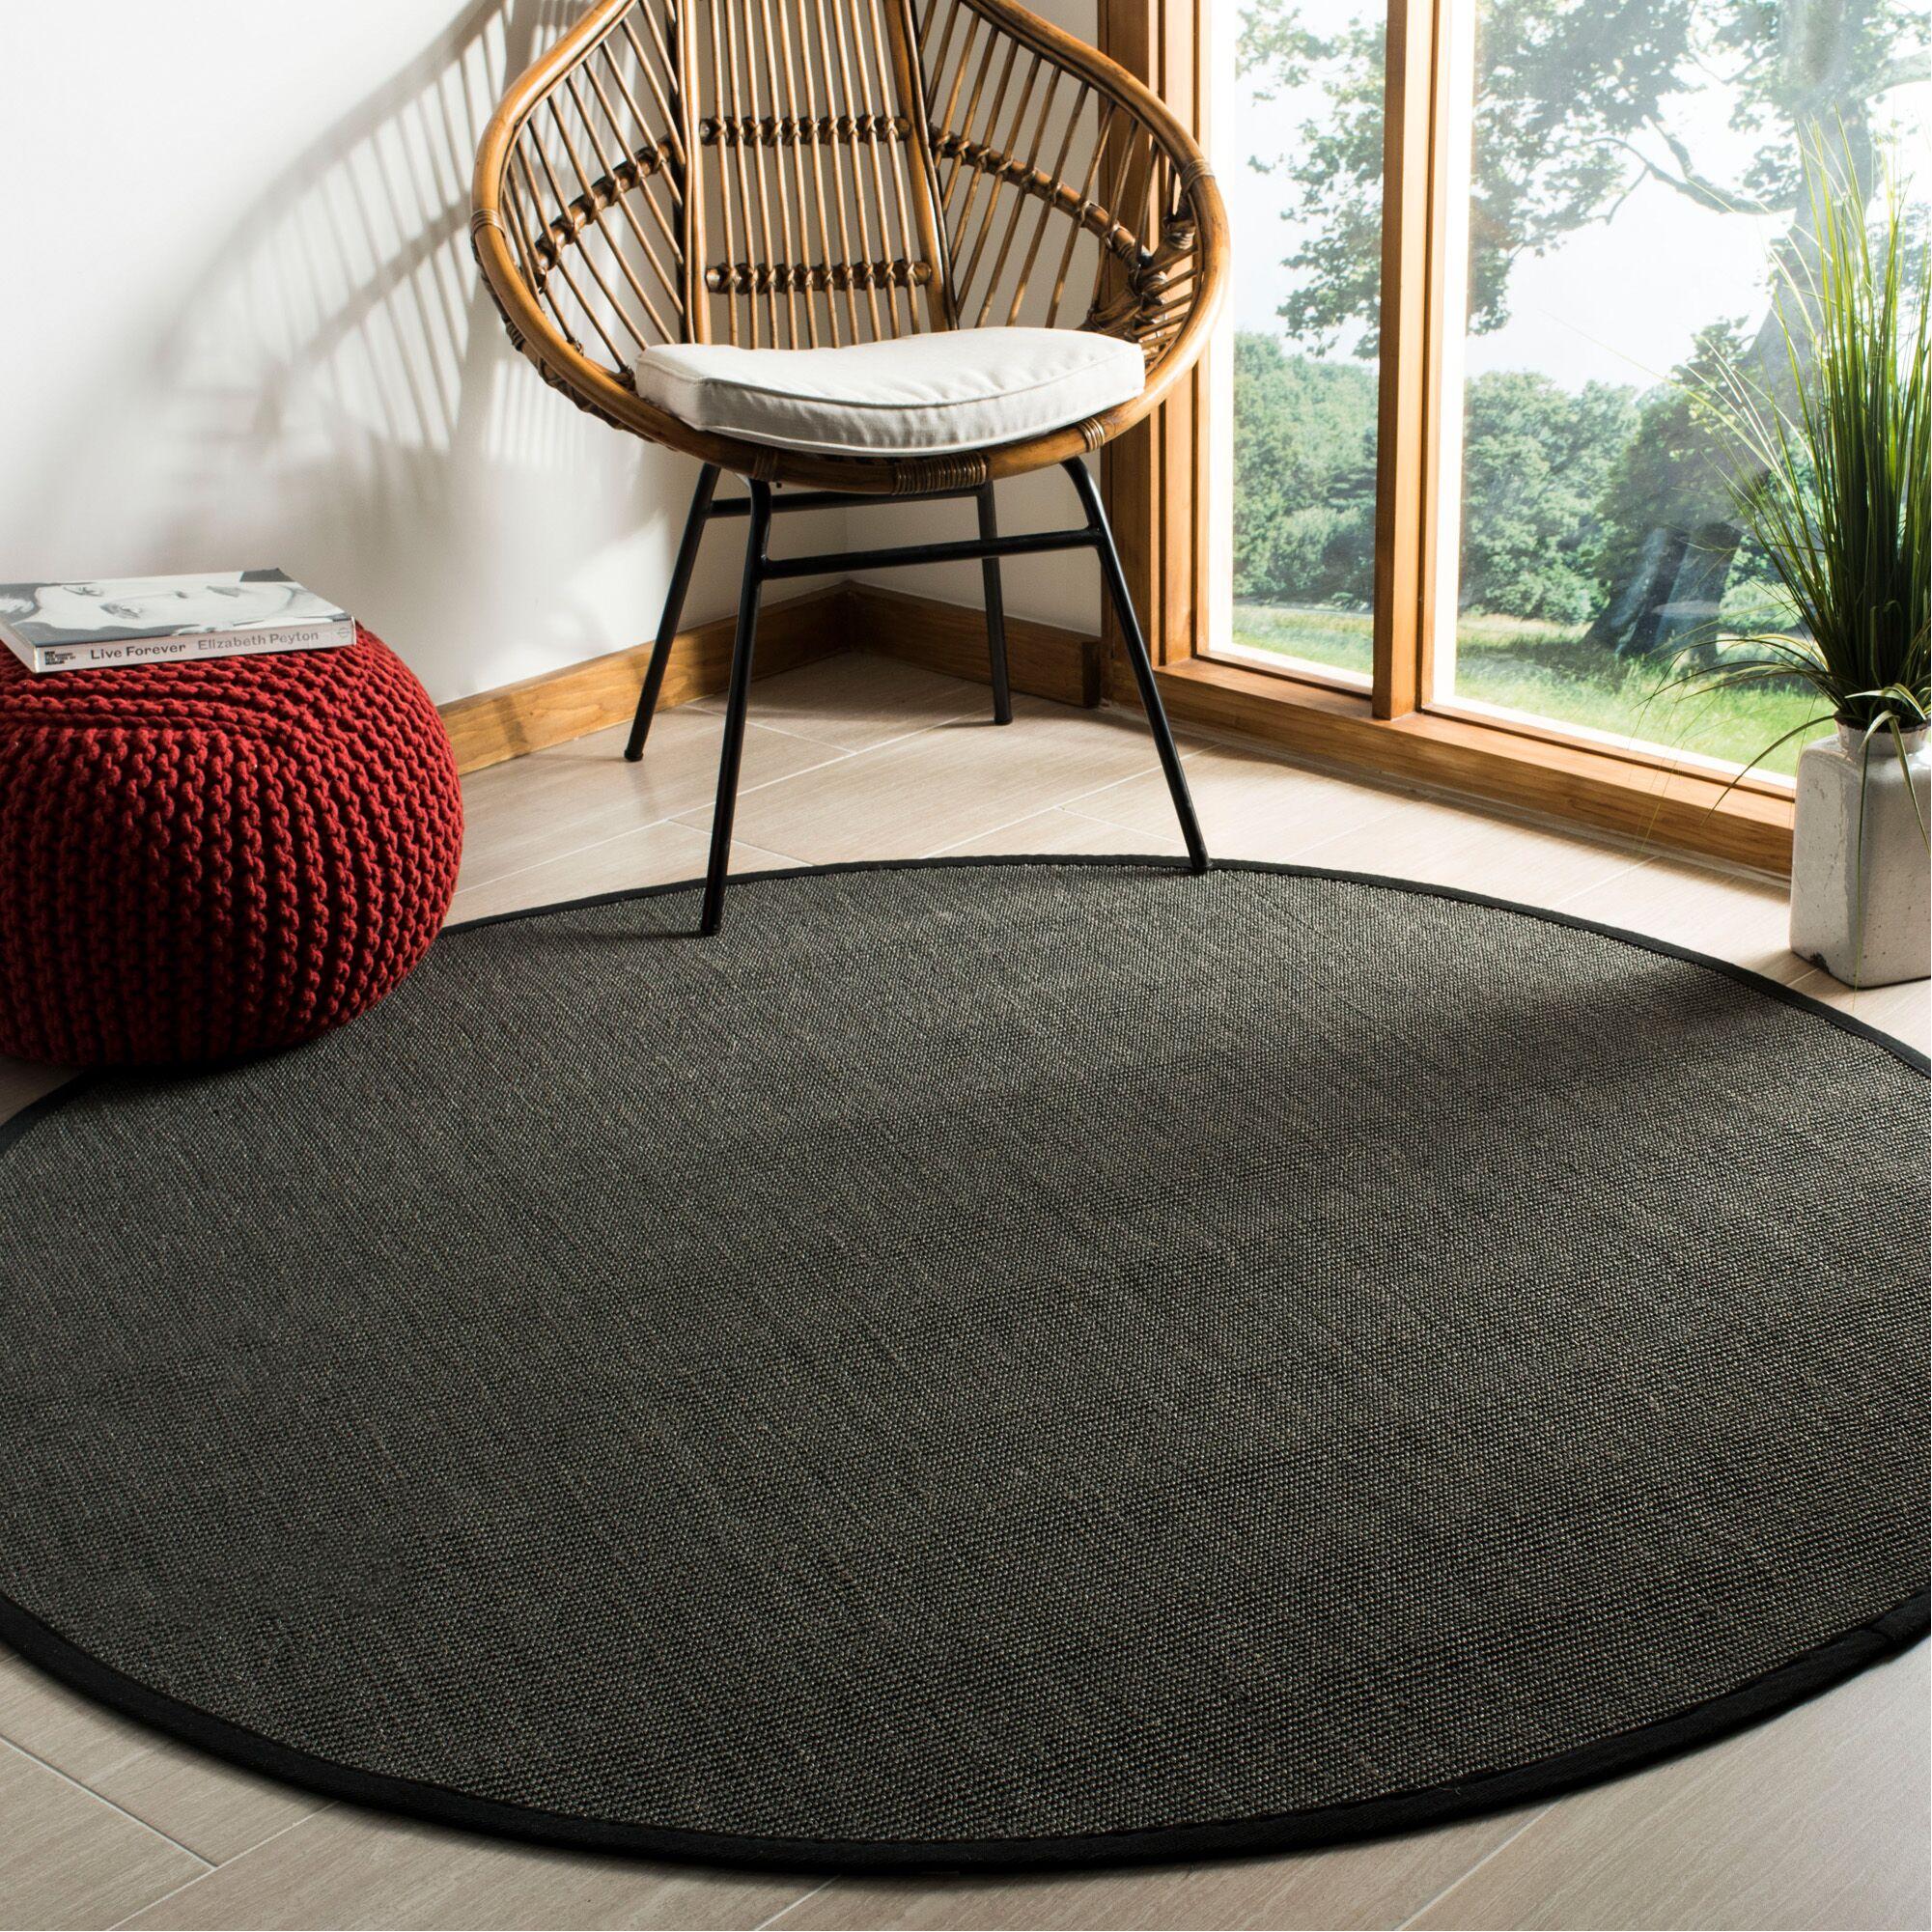 Wyckoff Black Area Rug Rug Size: Round 6'